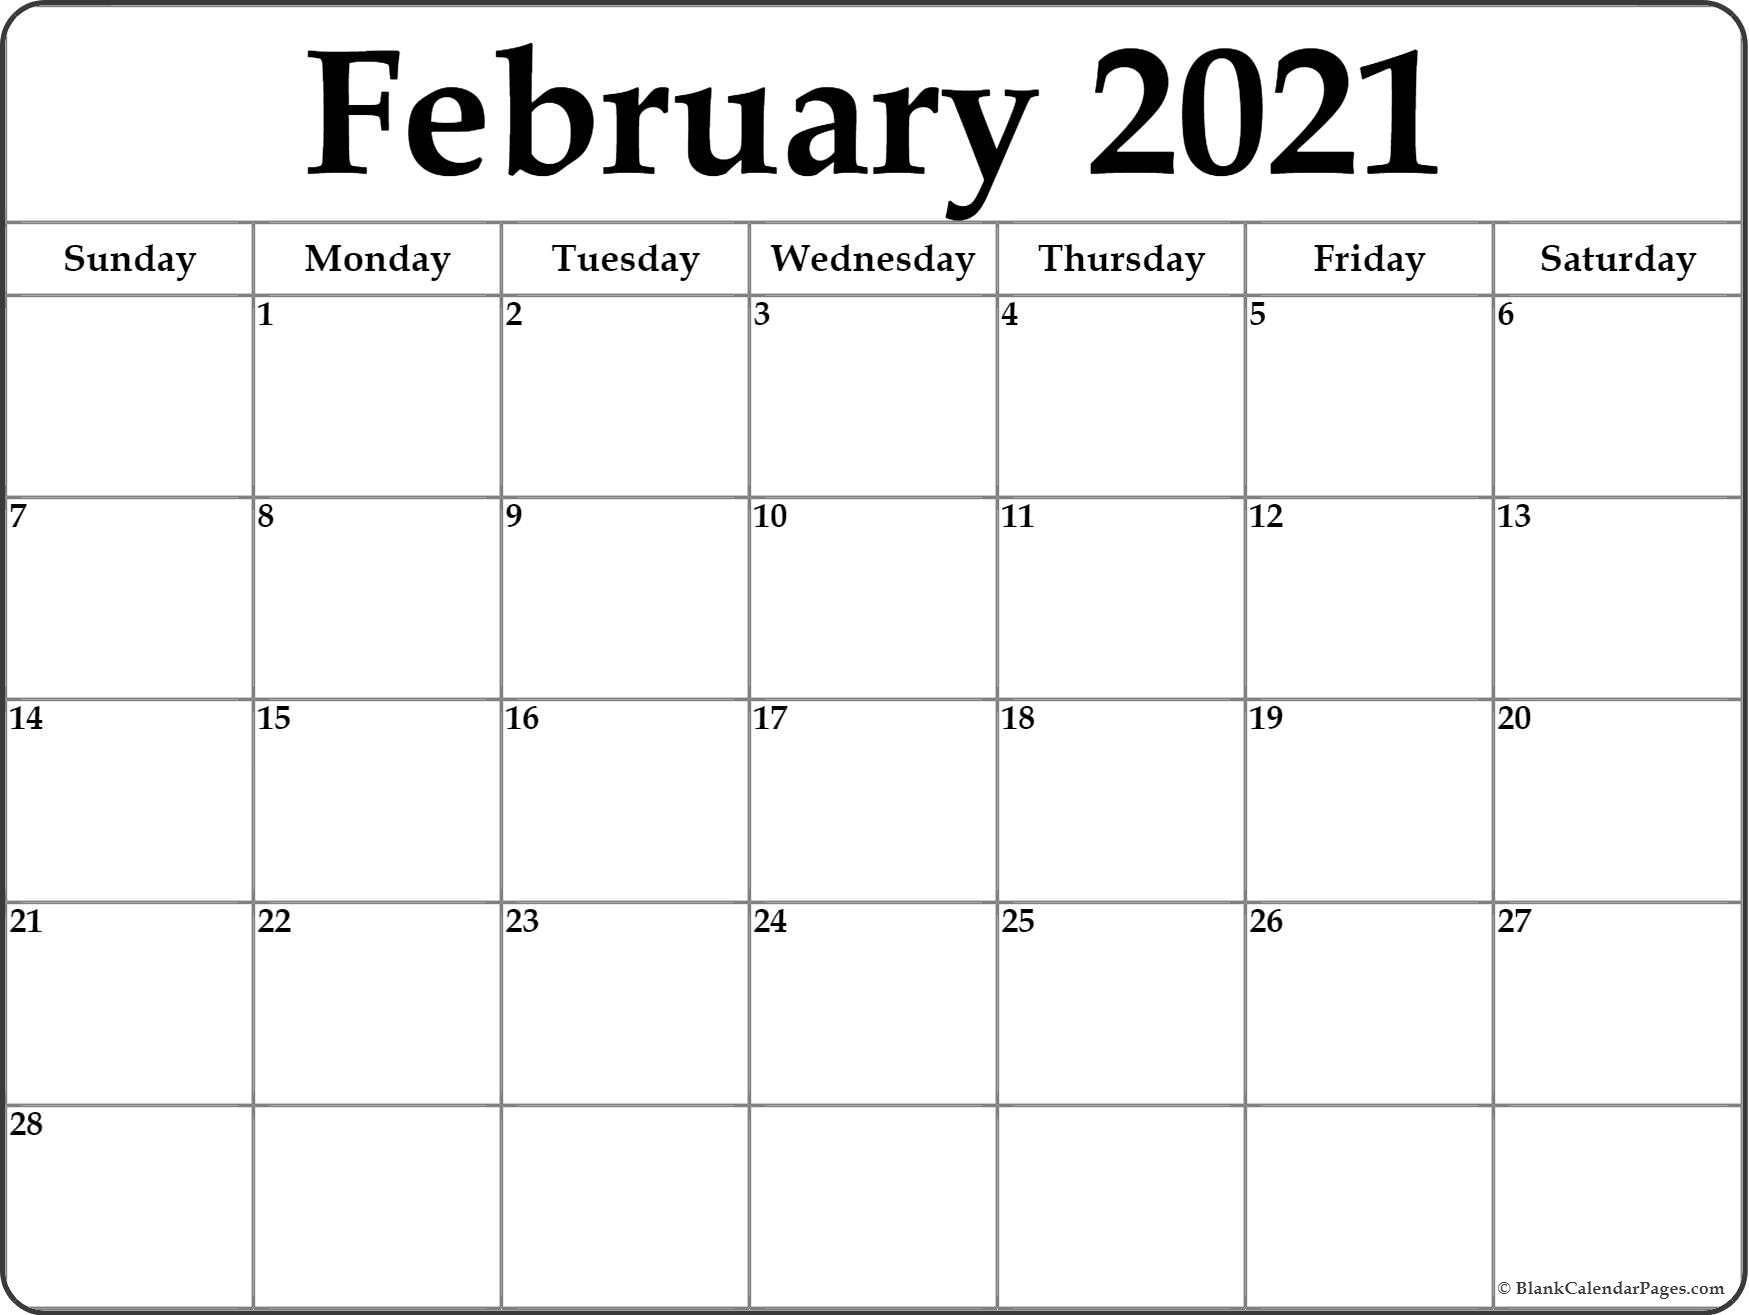 February 2021 Calendar | Free Printable Monthly Calendars  Summer Months 2021 Calendar